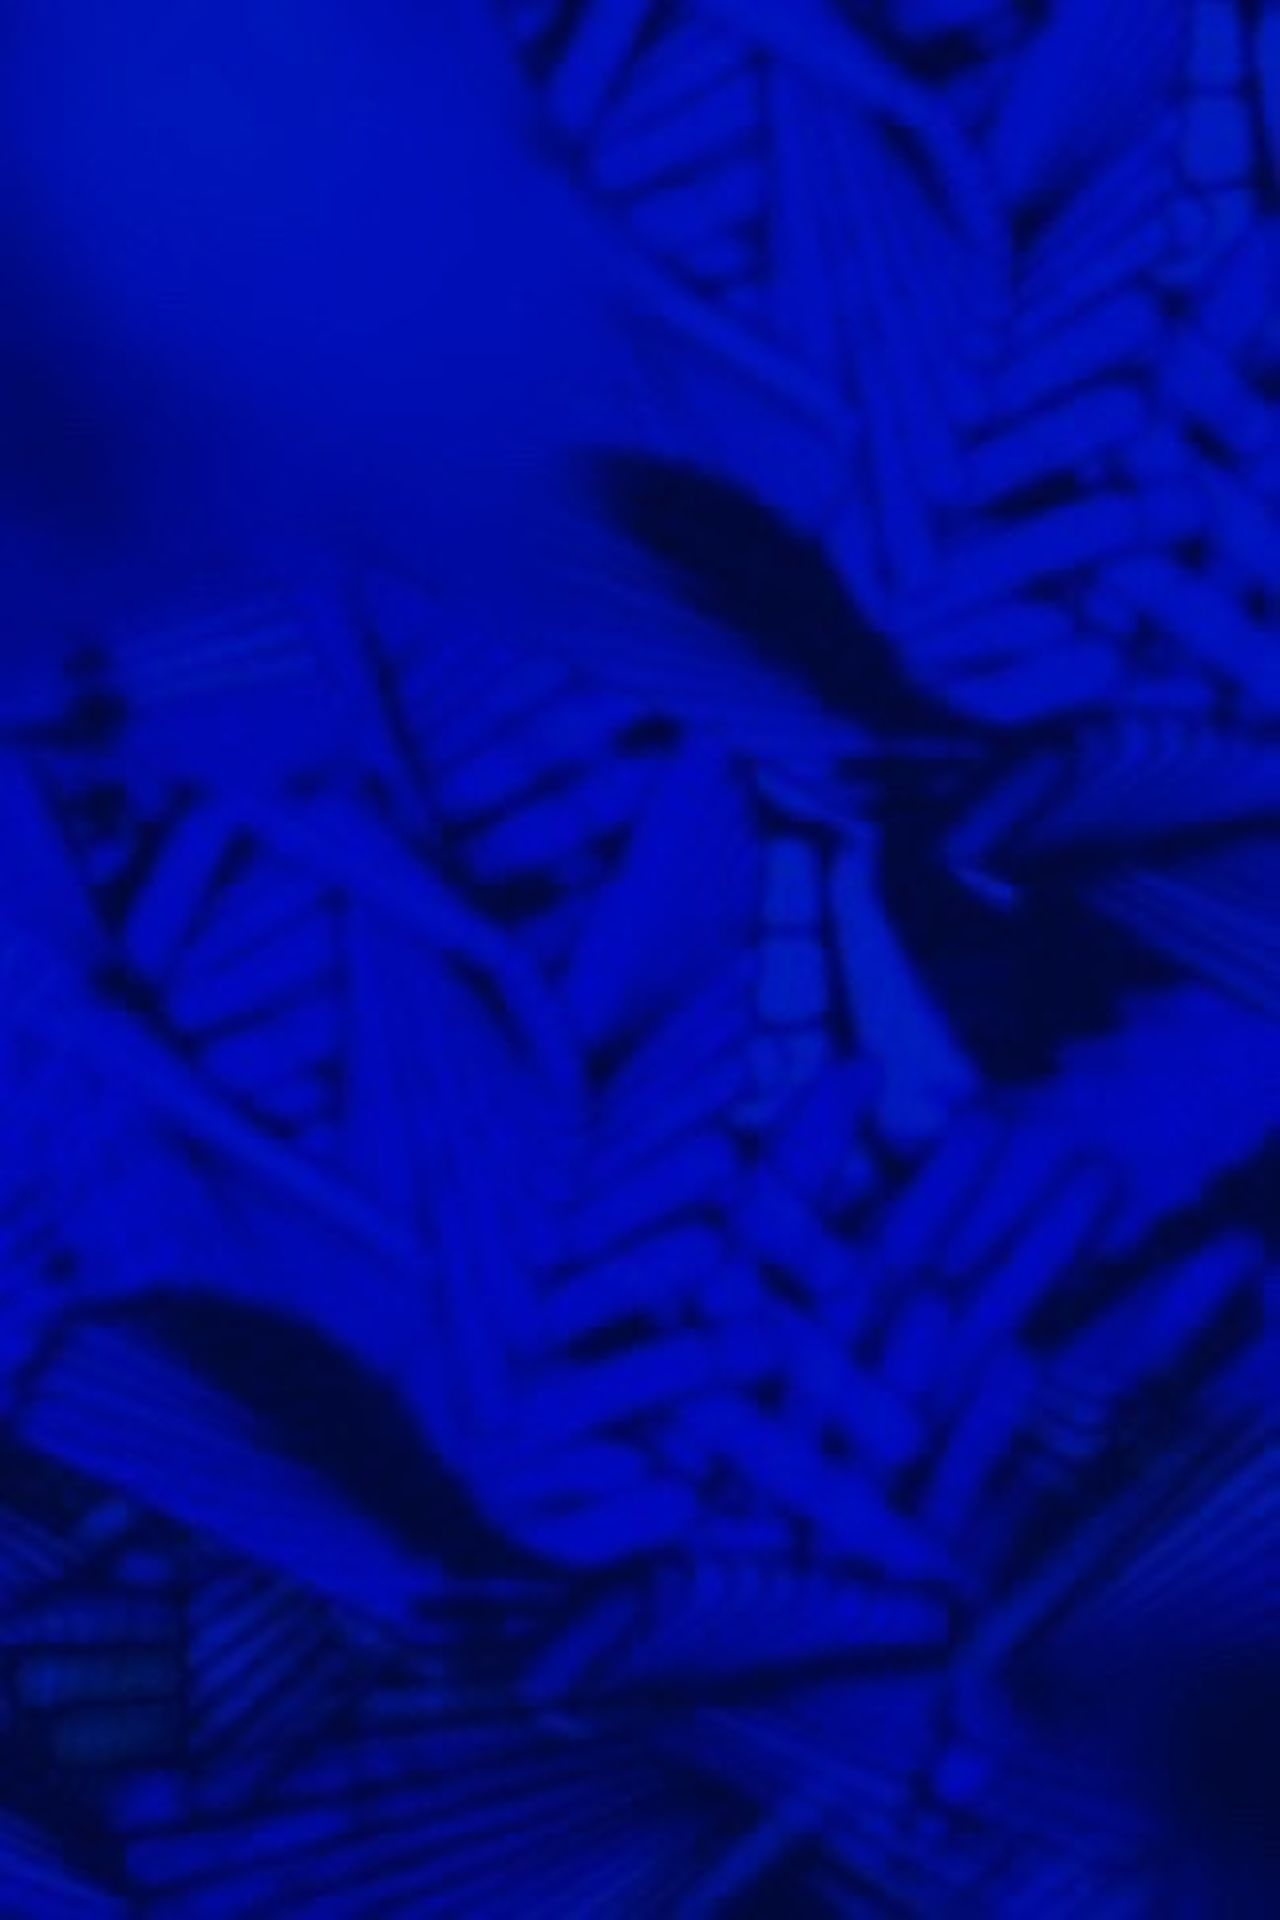 Cobalt Blue By Motorola